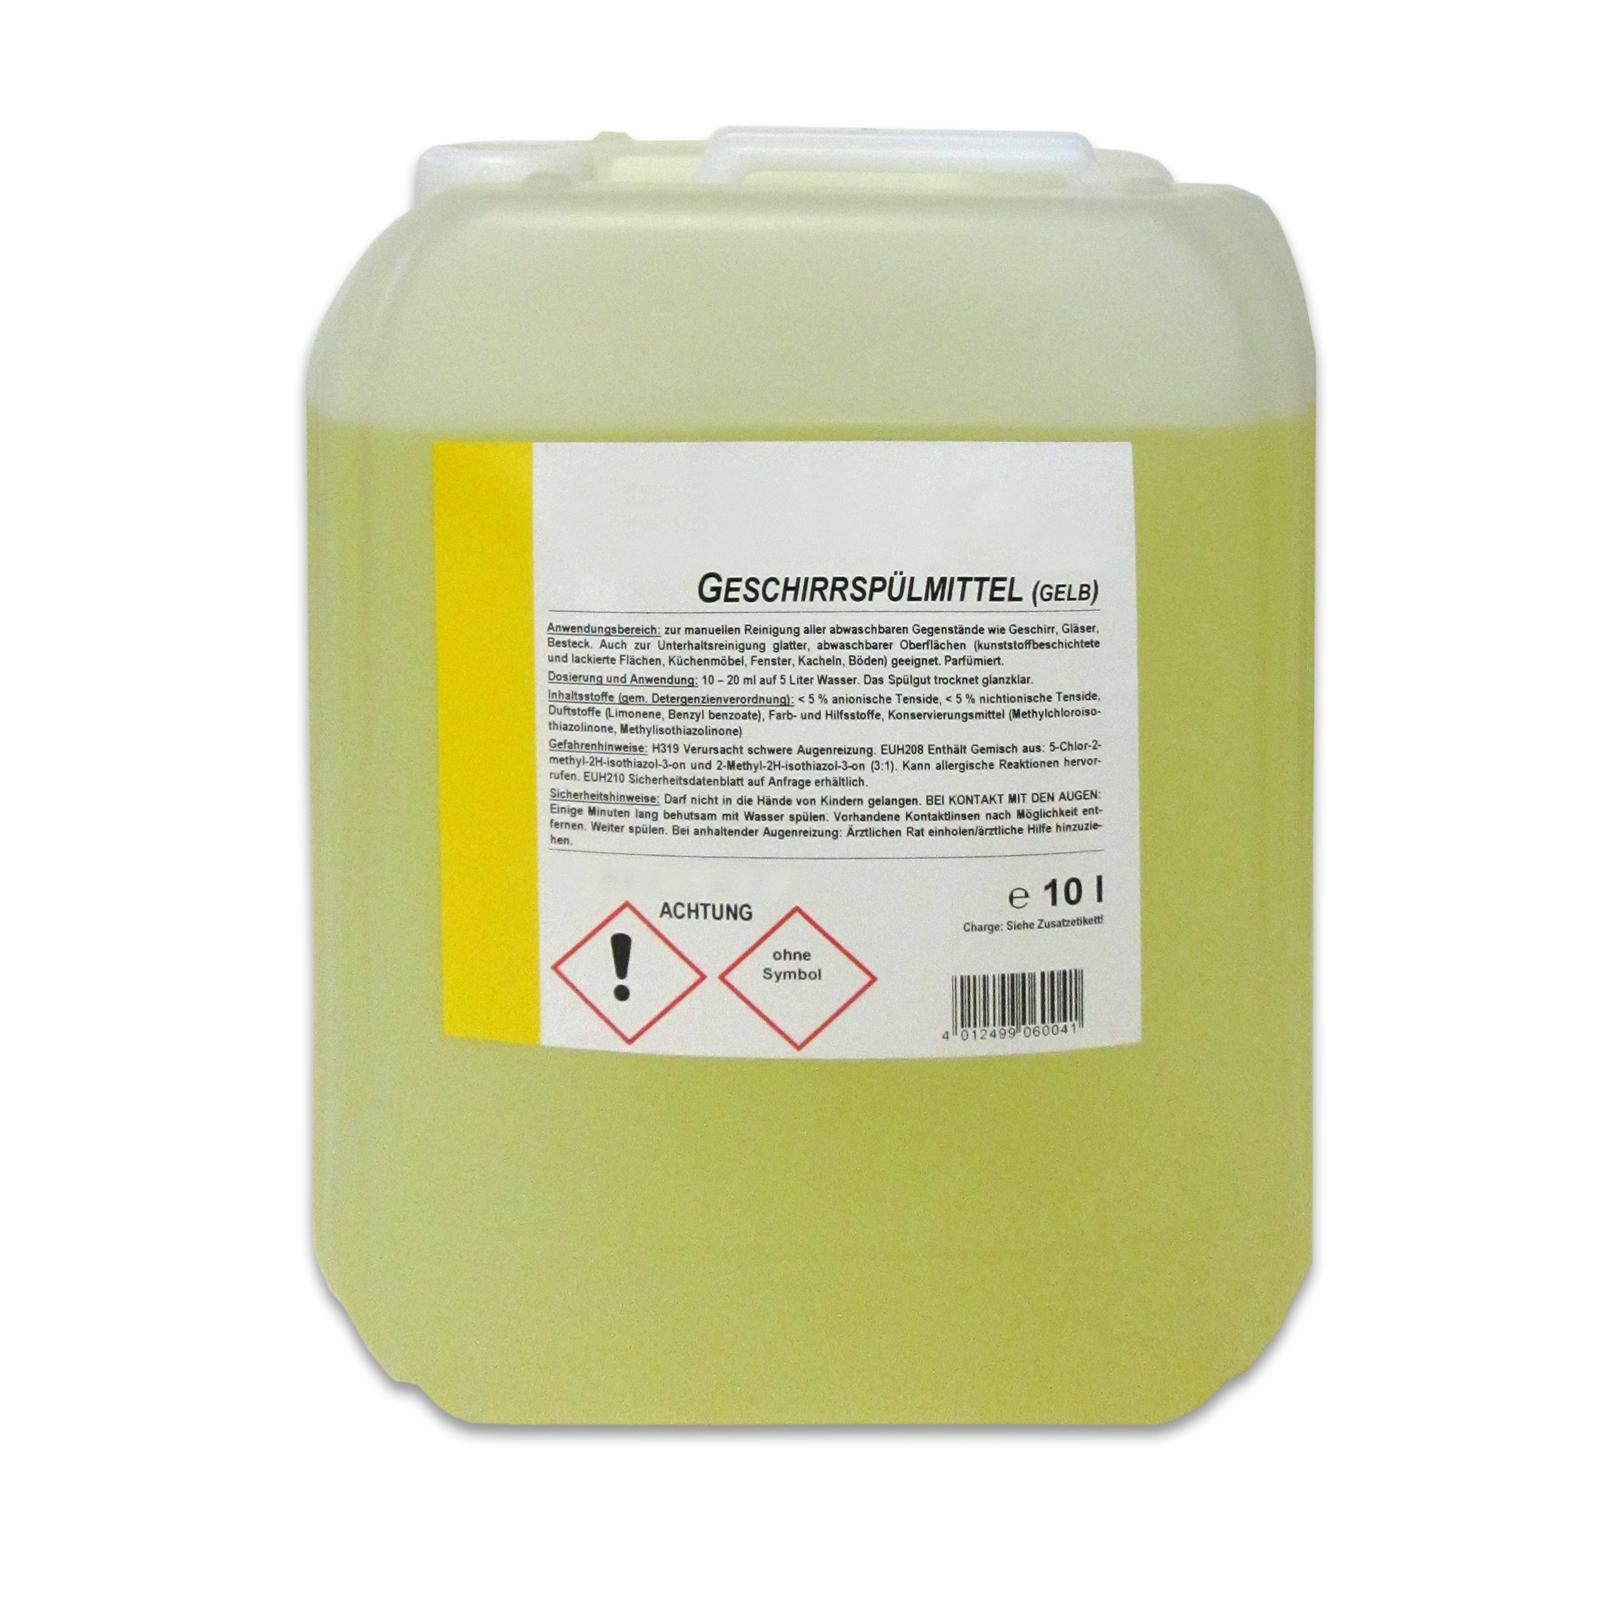 10 Liter Spülmittel / Geschirrspülmittel